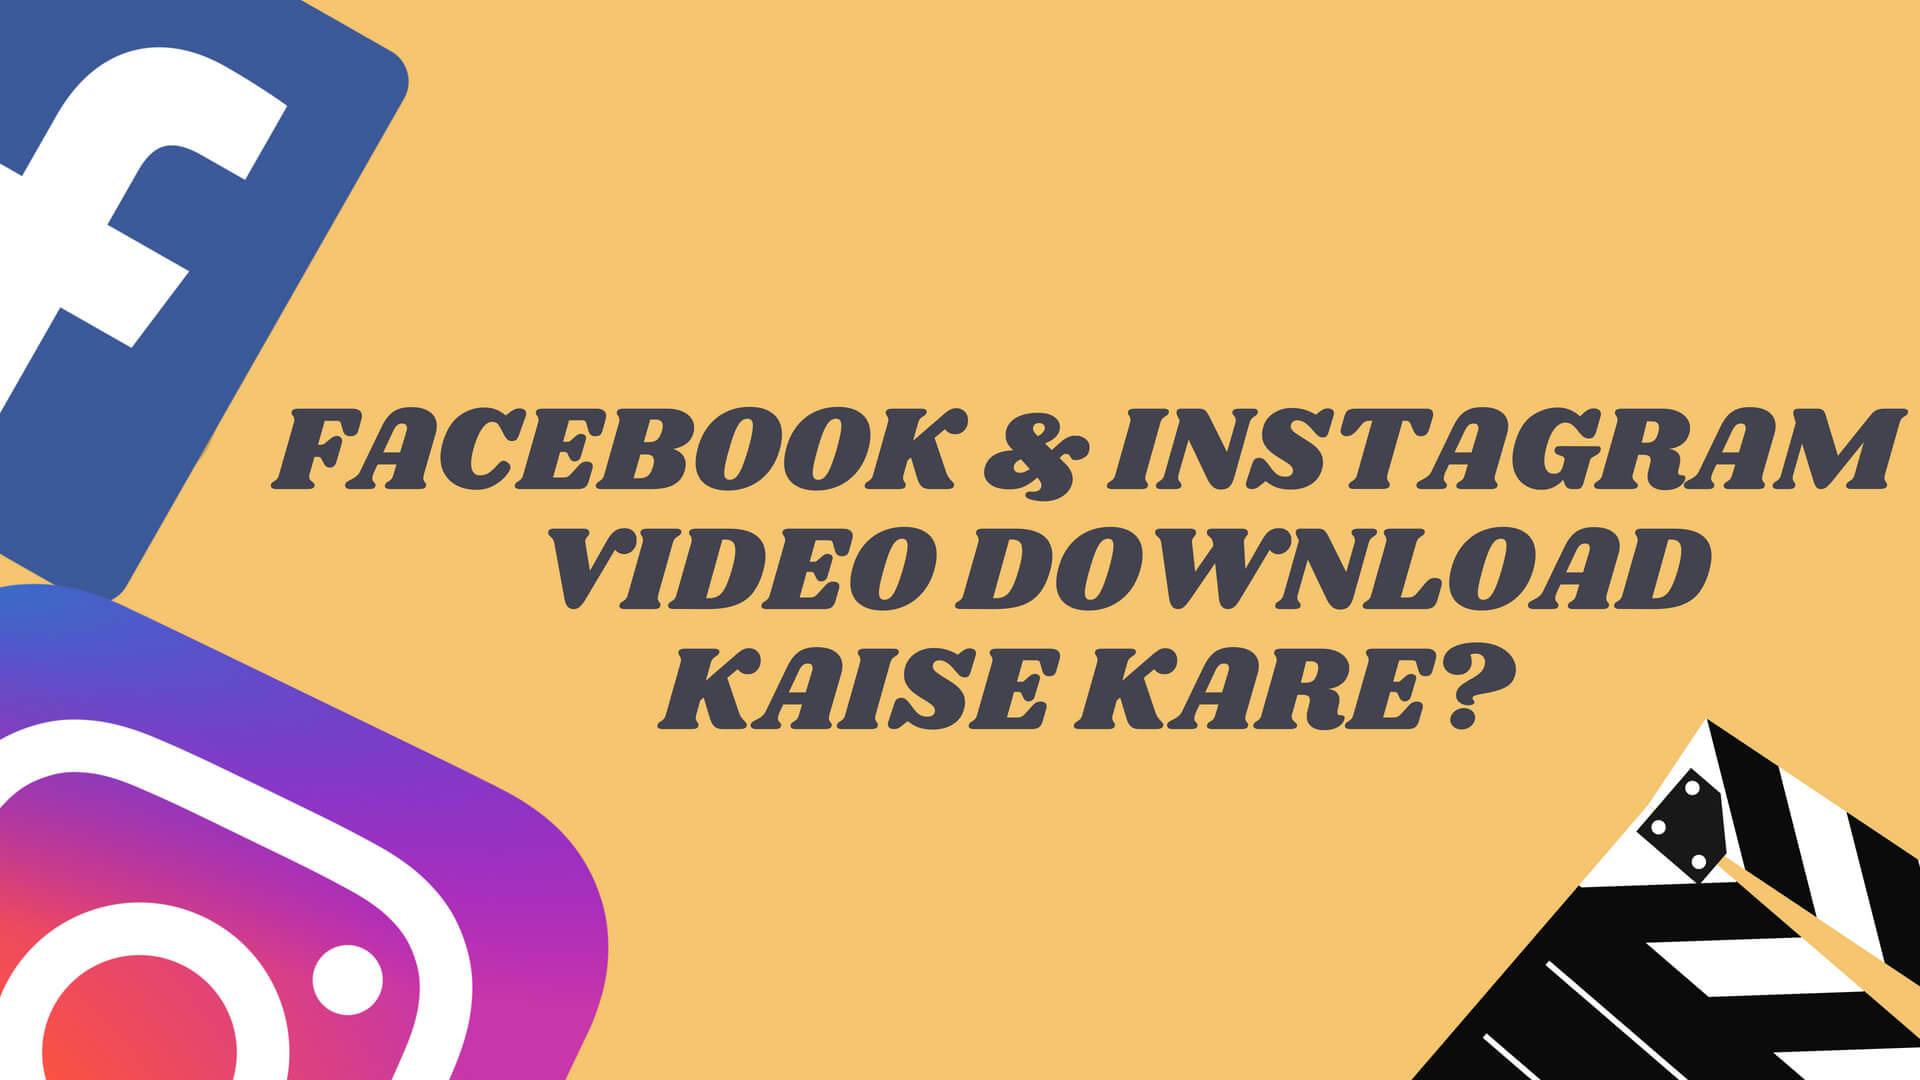 Facebook & Instagram Video Download Kaise Kare?